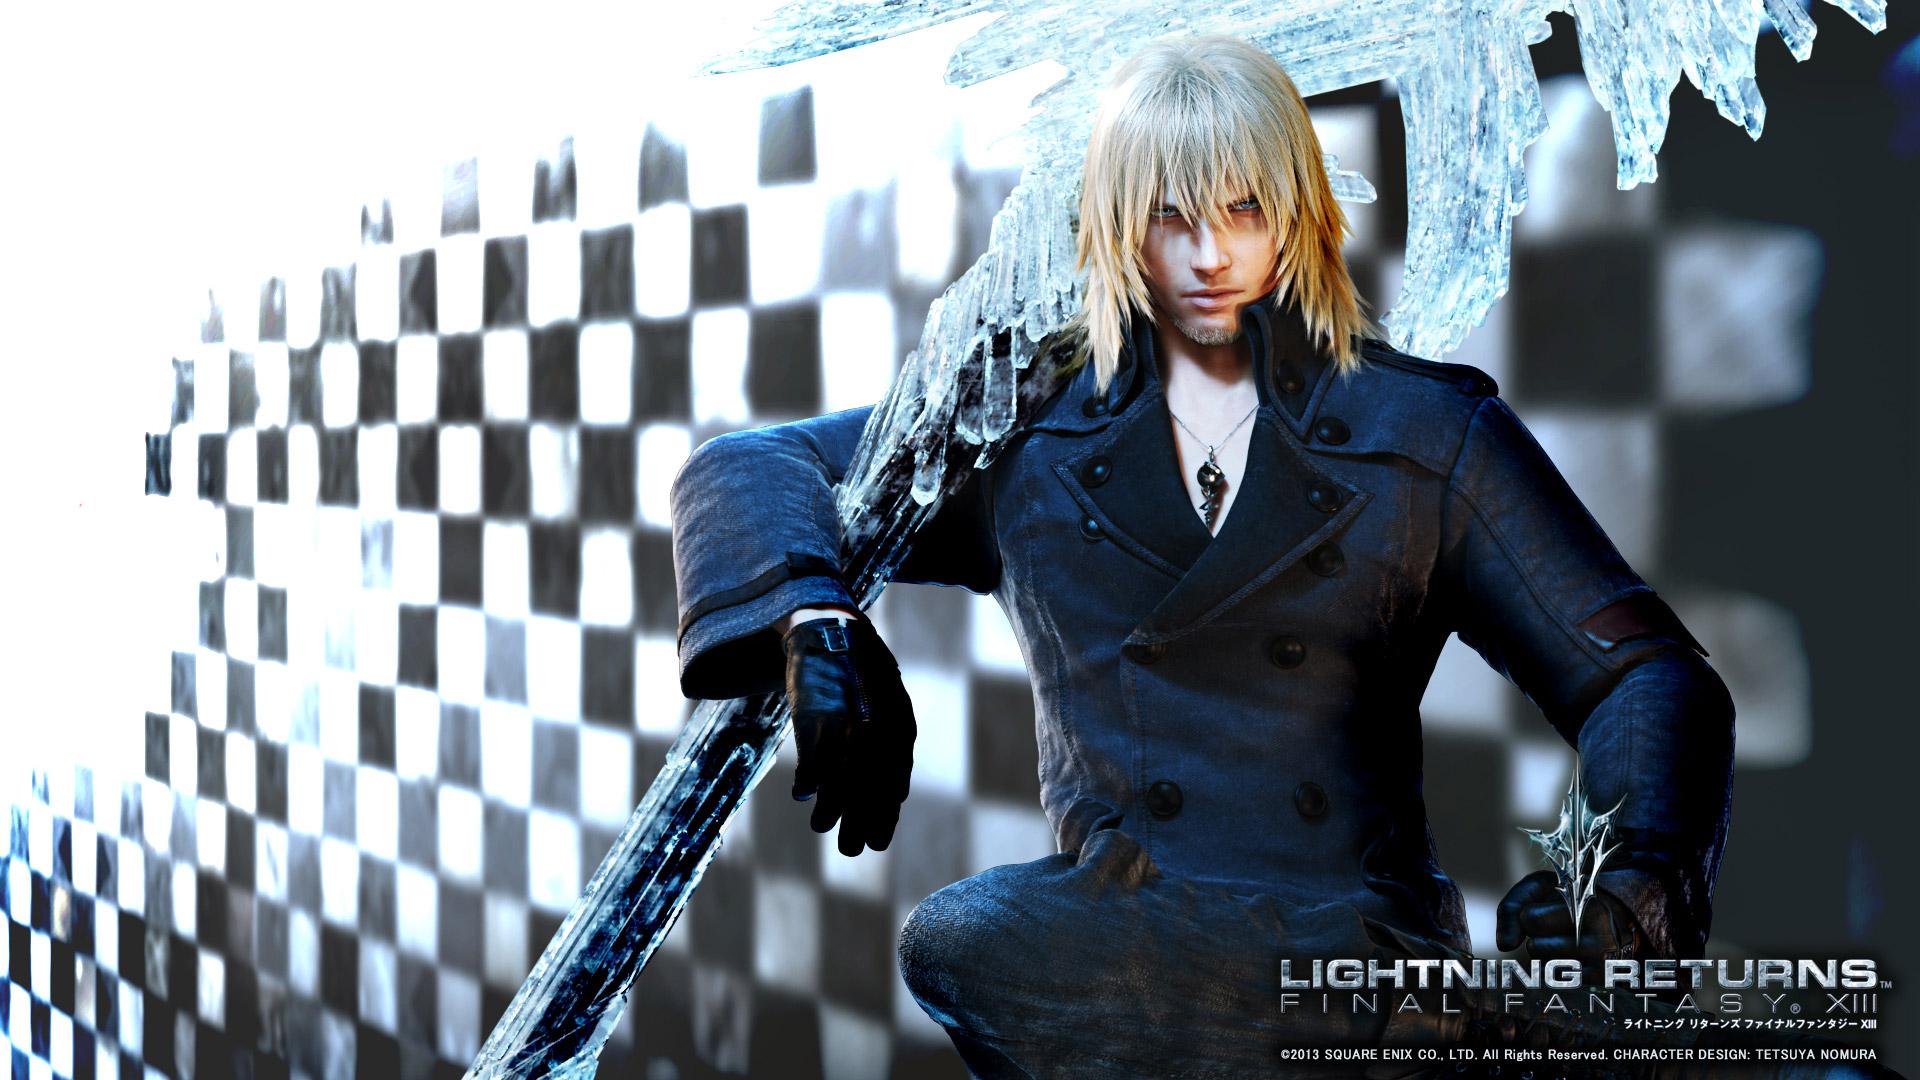 Free Lightning Returns: Final Fantasy XIII Wallpaper in 1920x1080